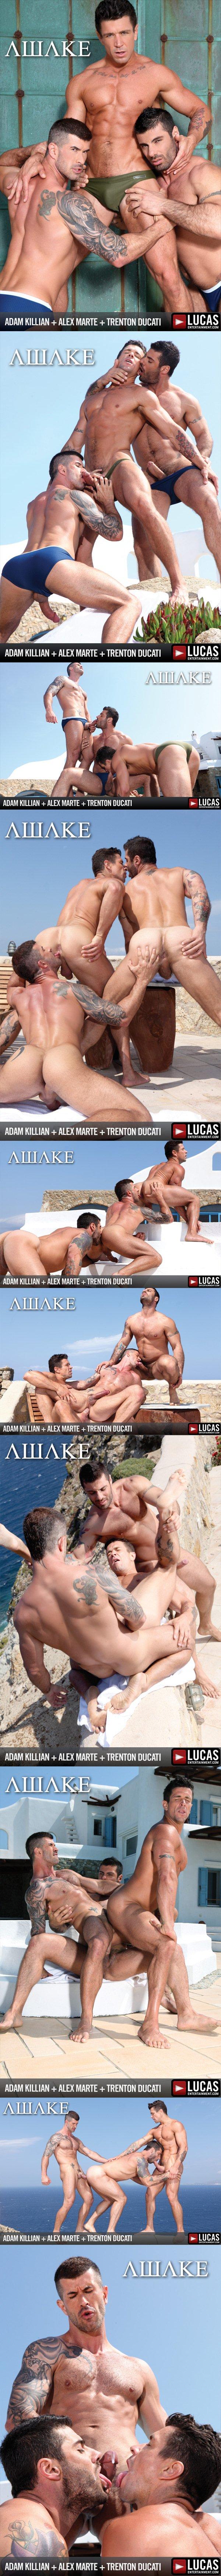 Hot threesome of Masculine and handsome Alex Marte Adam Killian and Trenton Ducati Flip-Fuck at Lucasentertainment 01